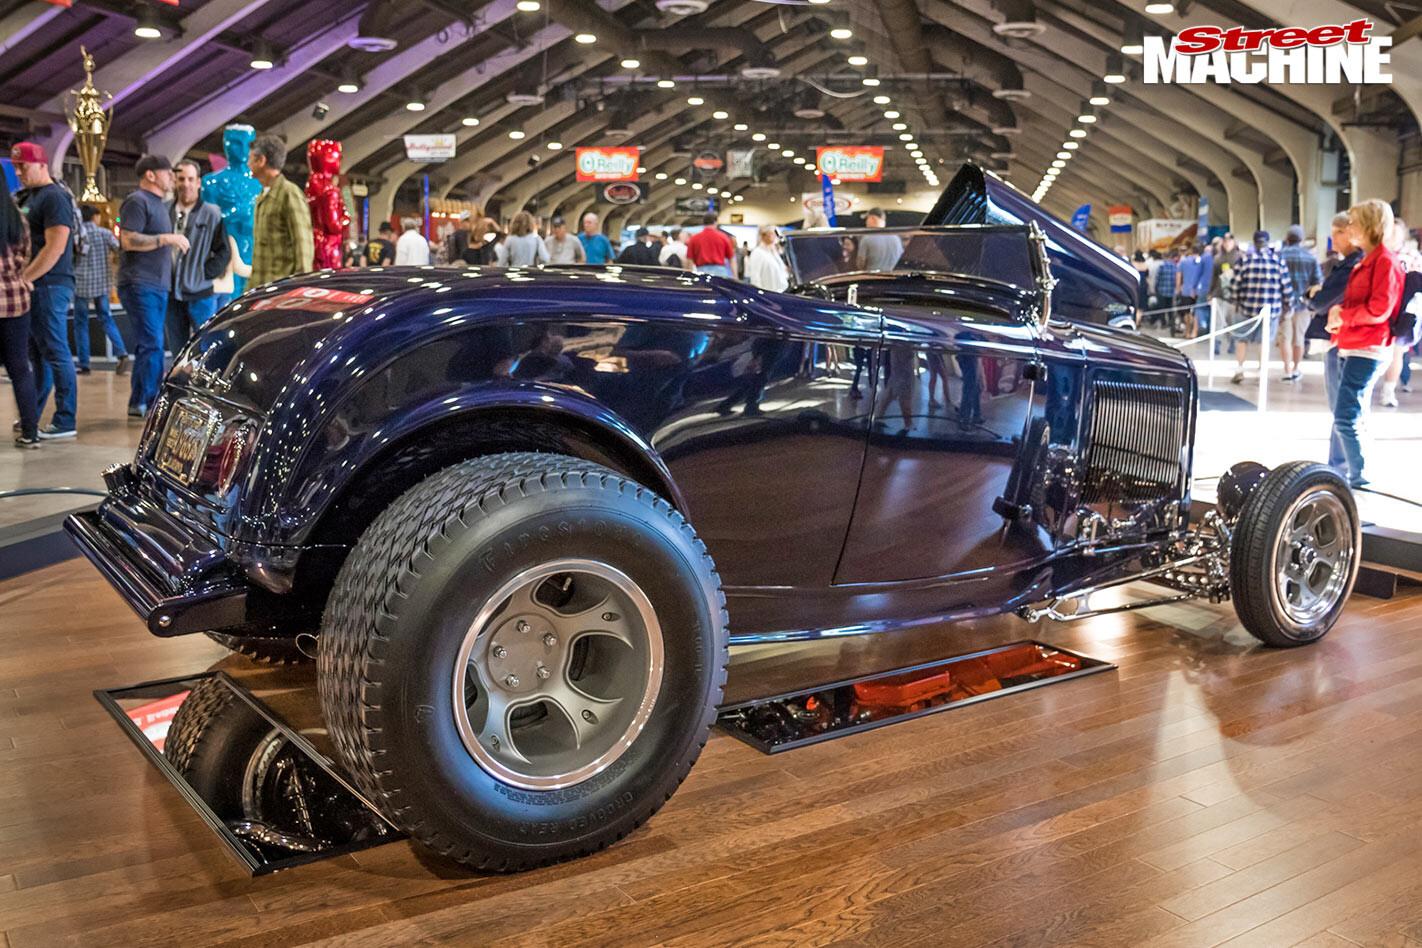 1932 Ford roadster, Stinger